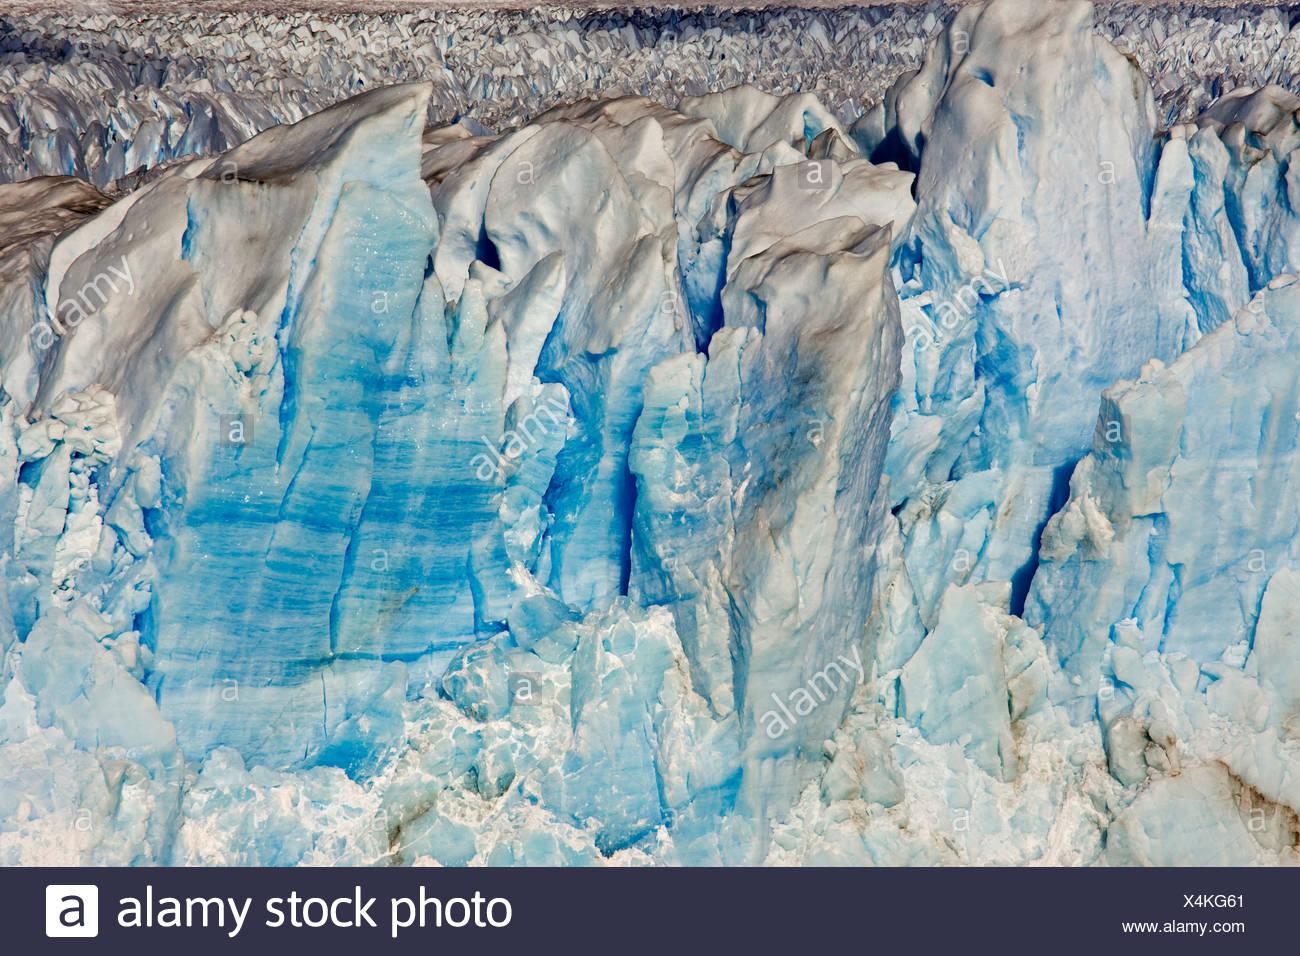 Ice at the glacier Perito Moreno, National Park Los Glaciares, Argentina, Patagonia, South America Stock Photo